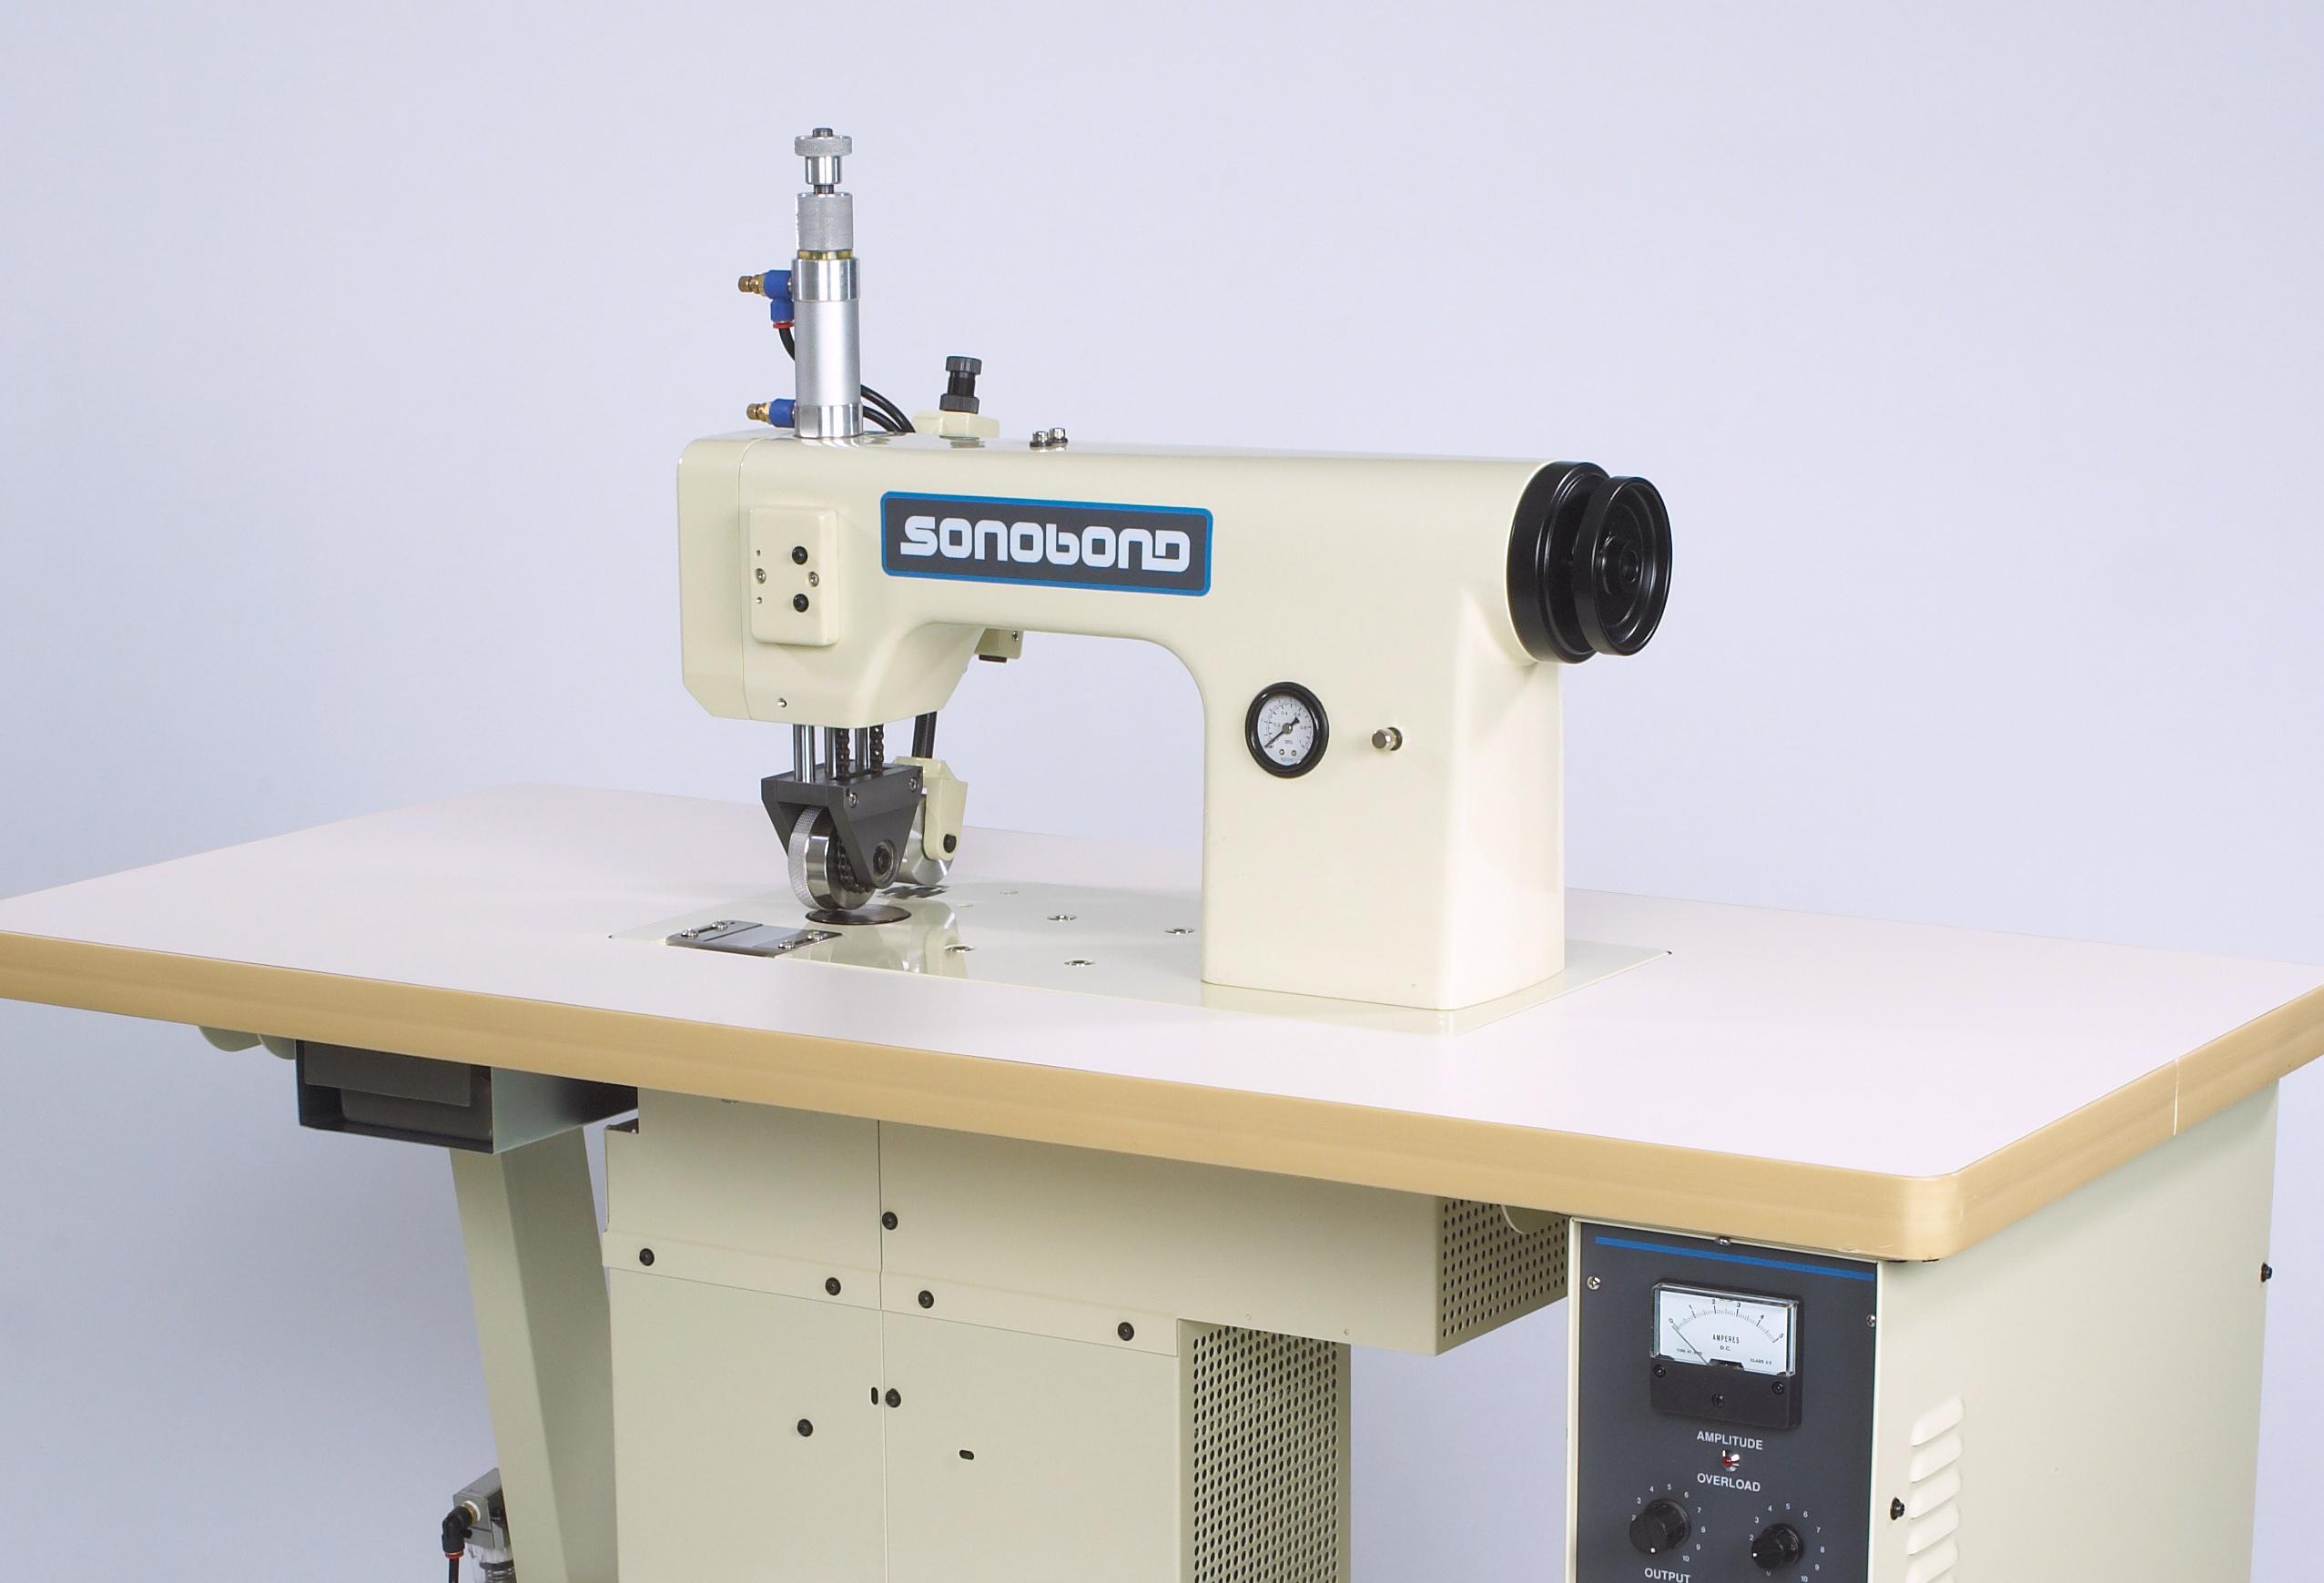 canine protective vest company chooses sonobond ultrasonics